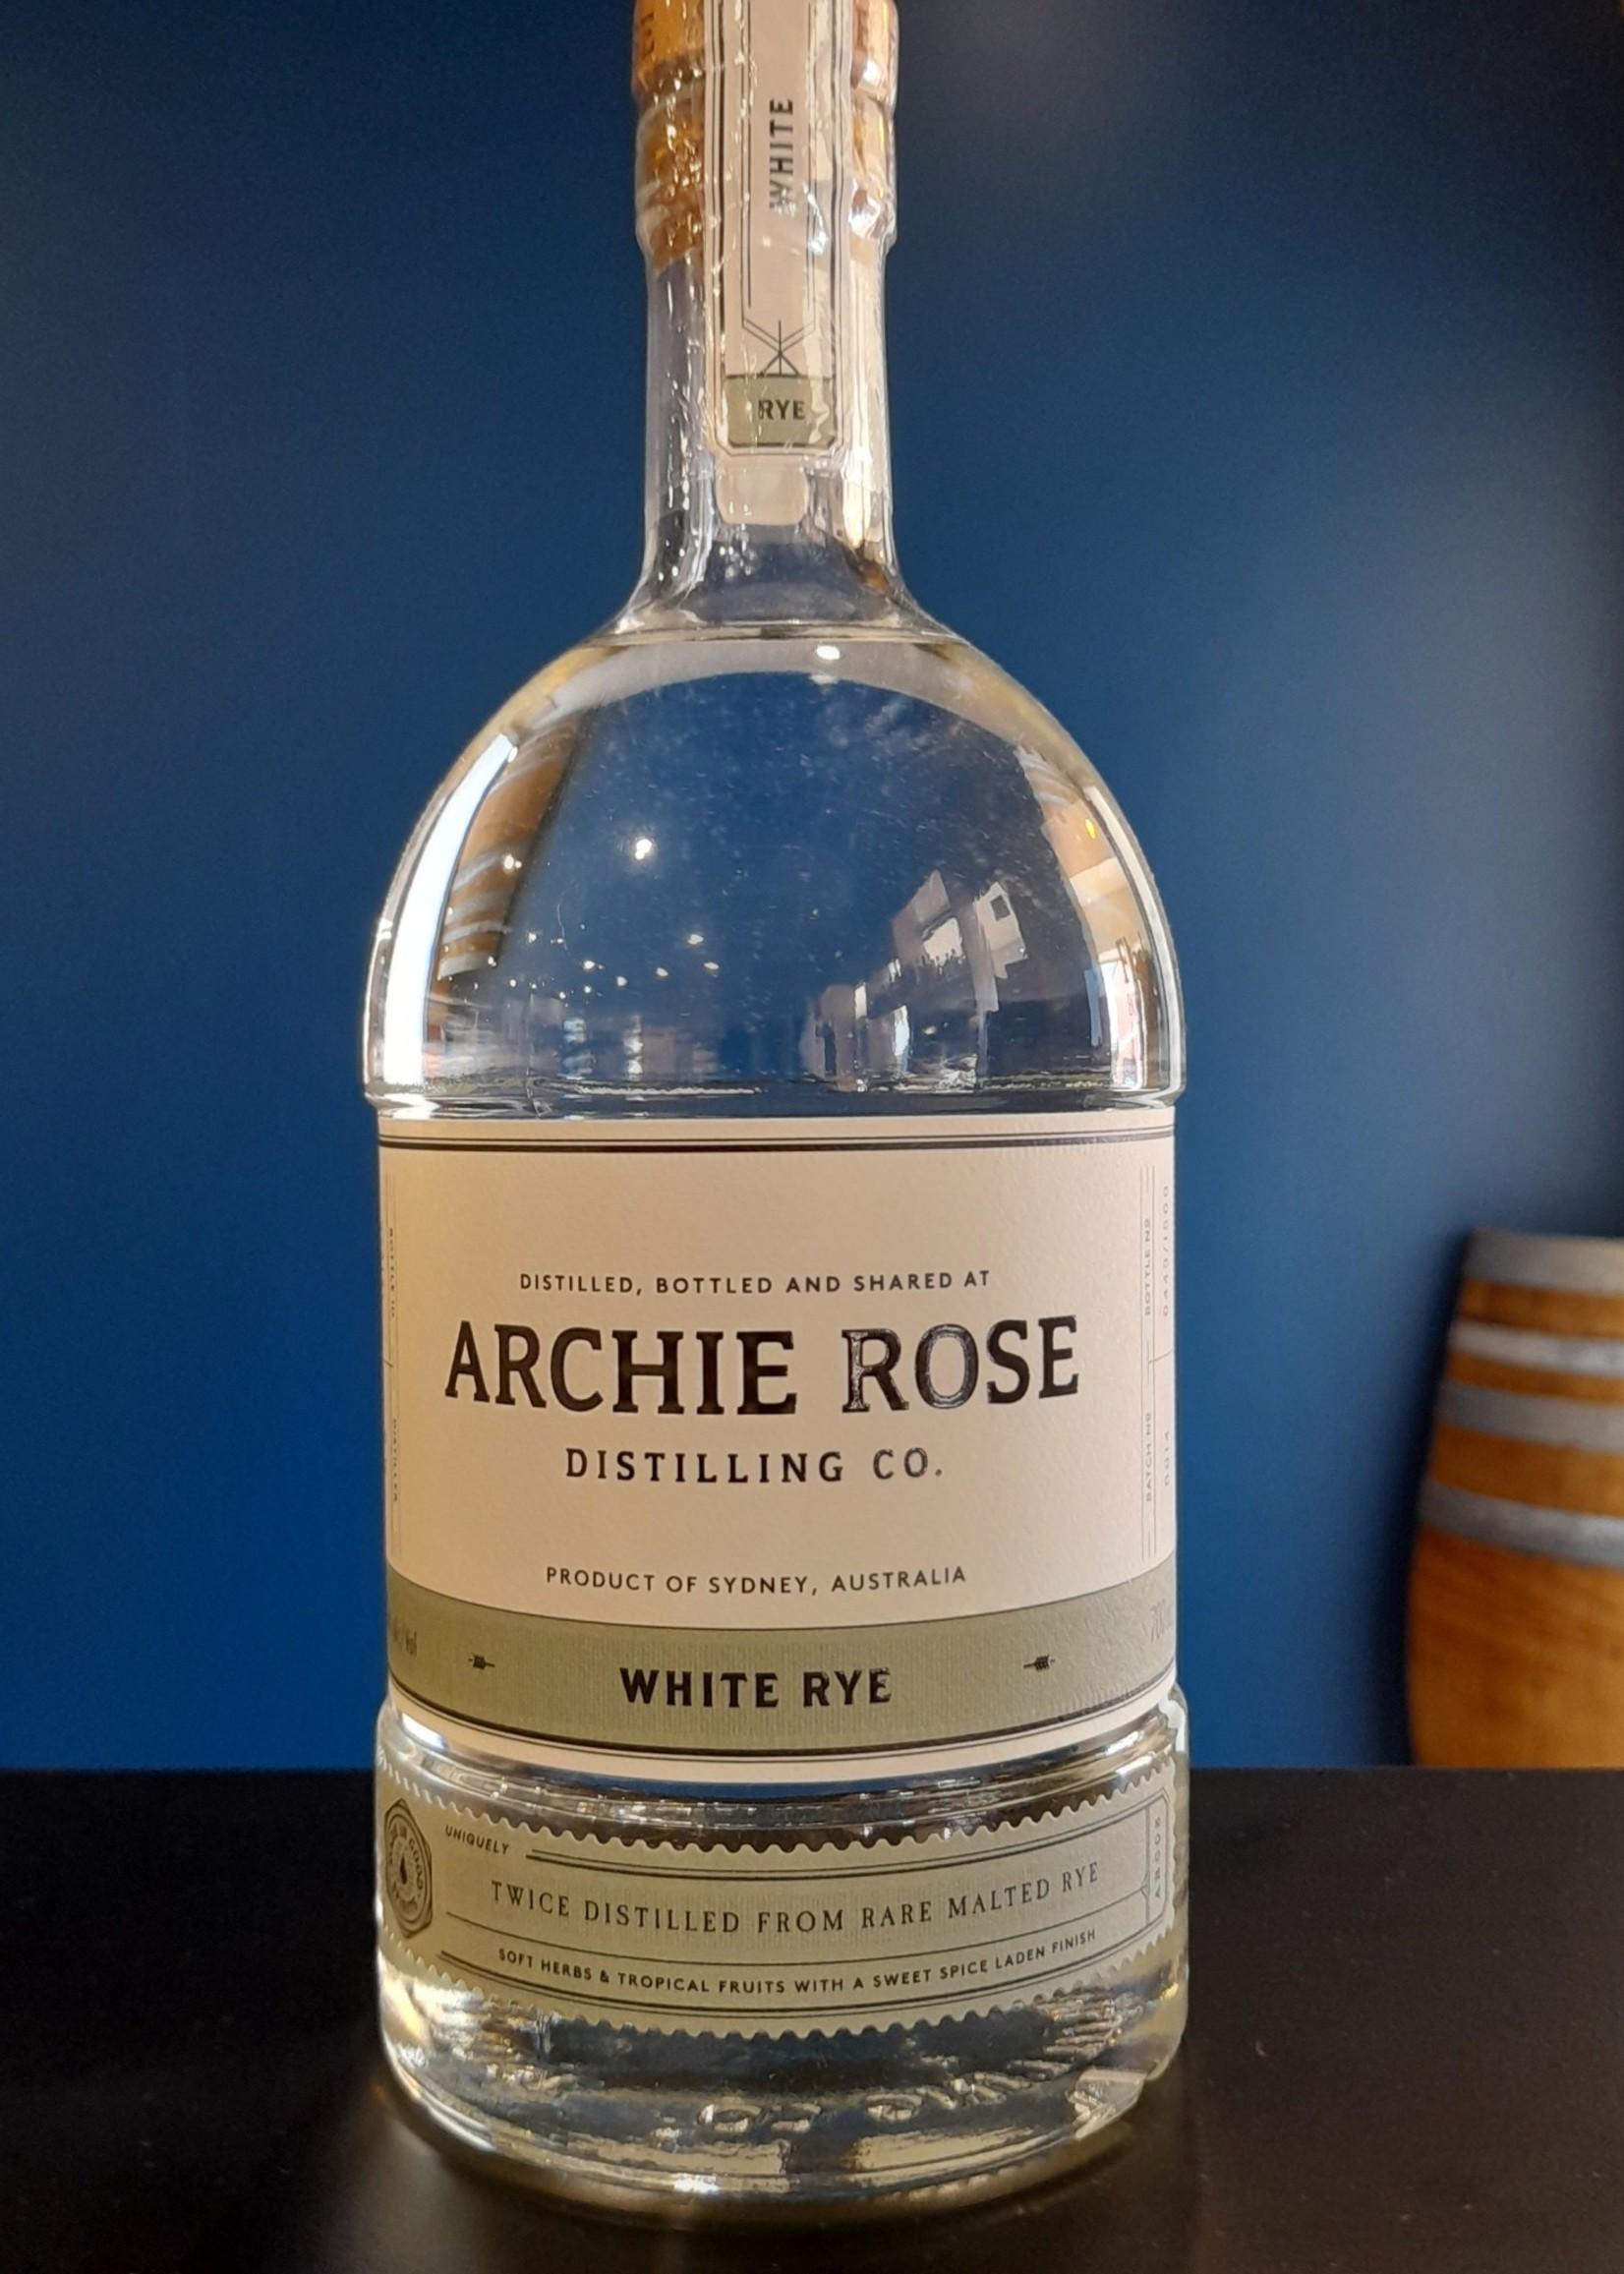 Archie Rose Archie Rose White Rye